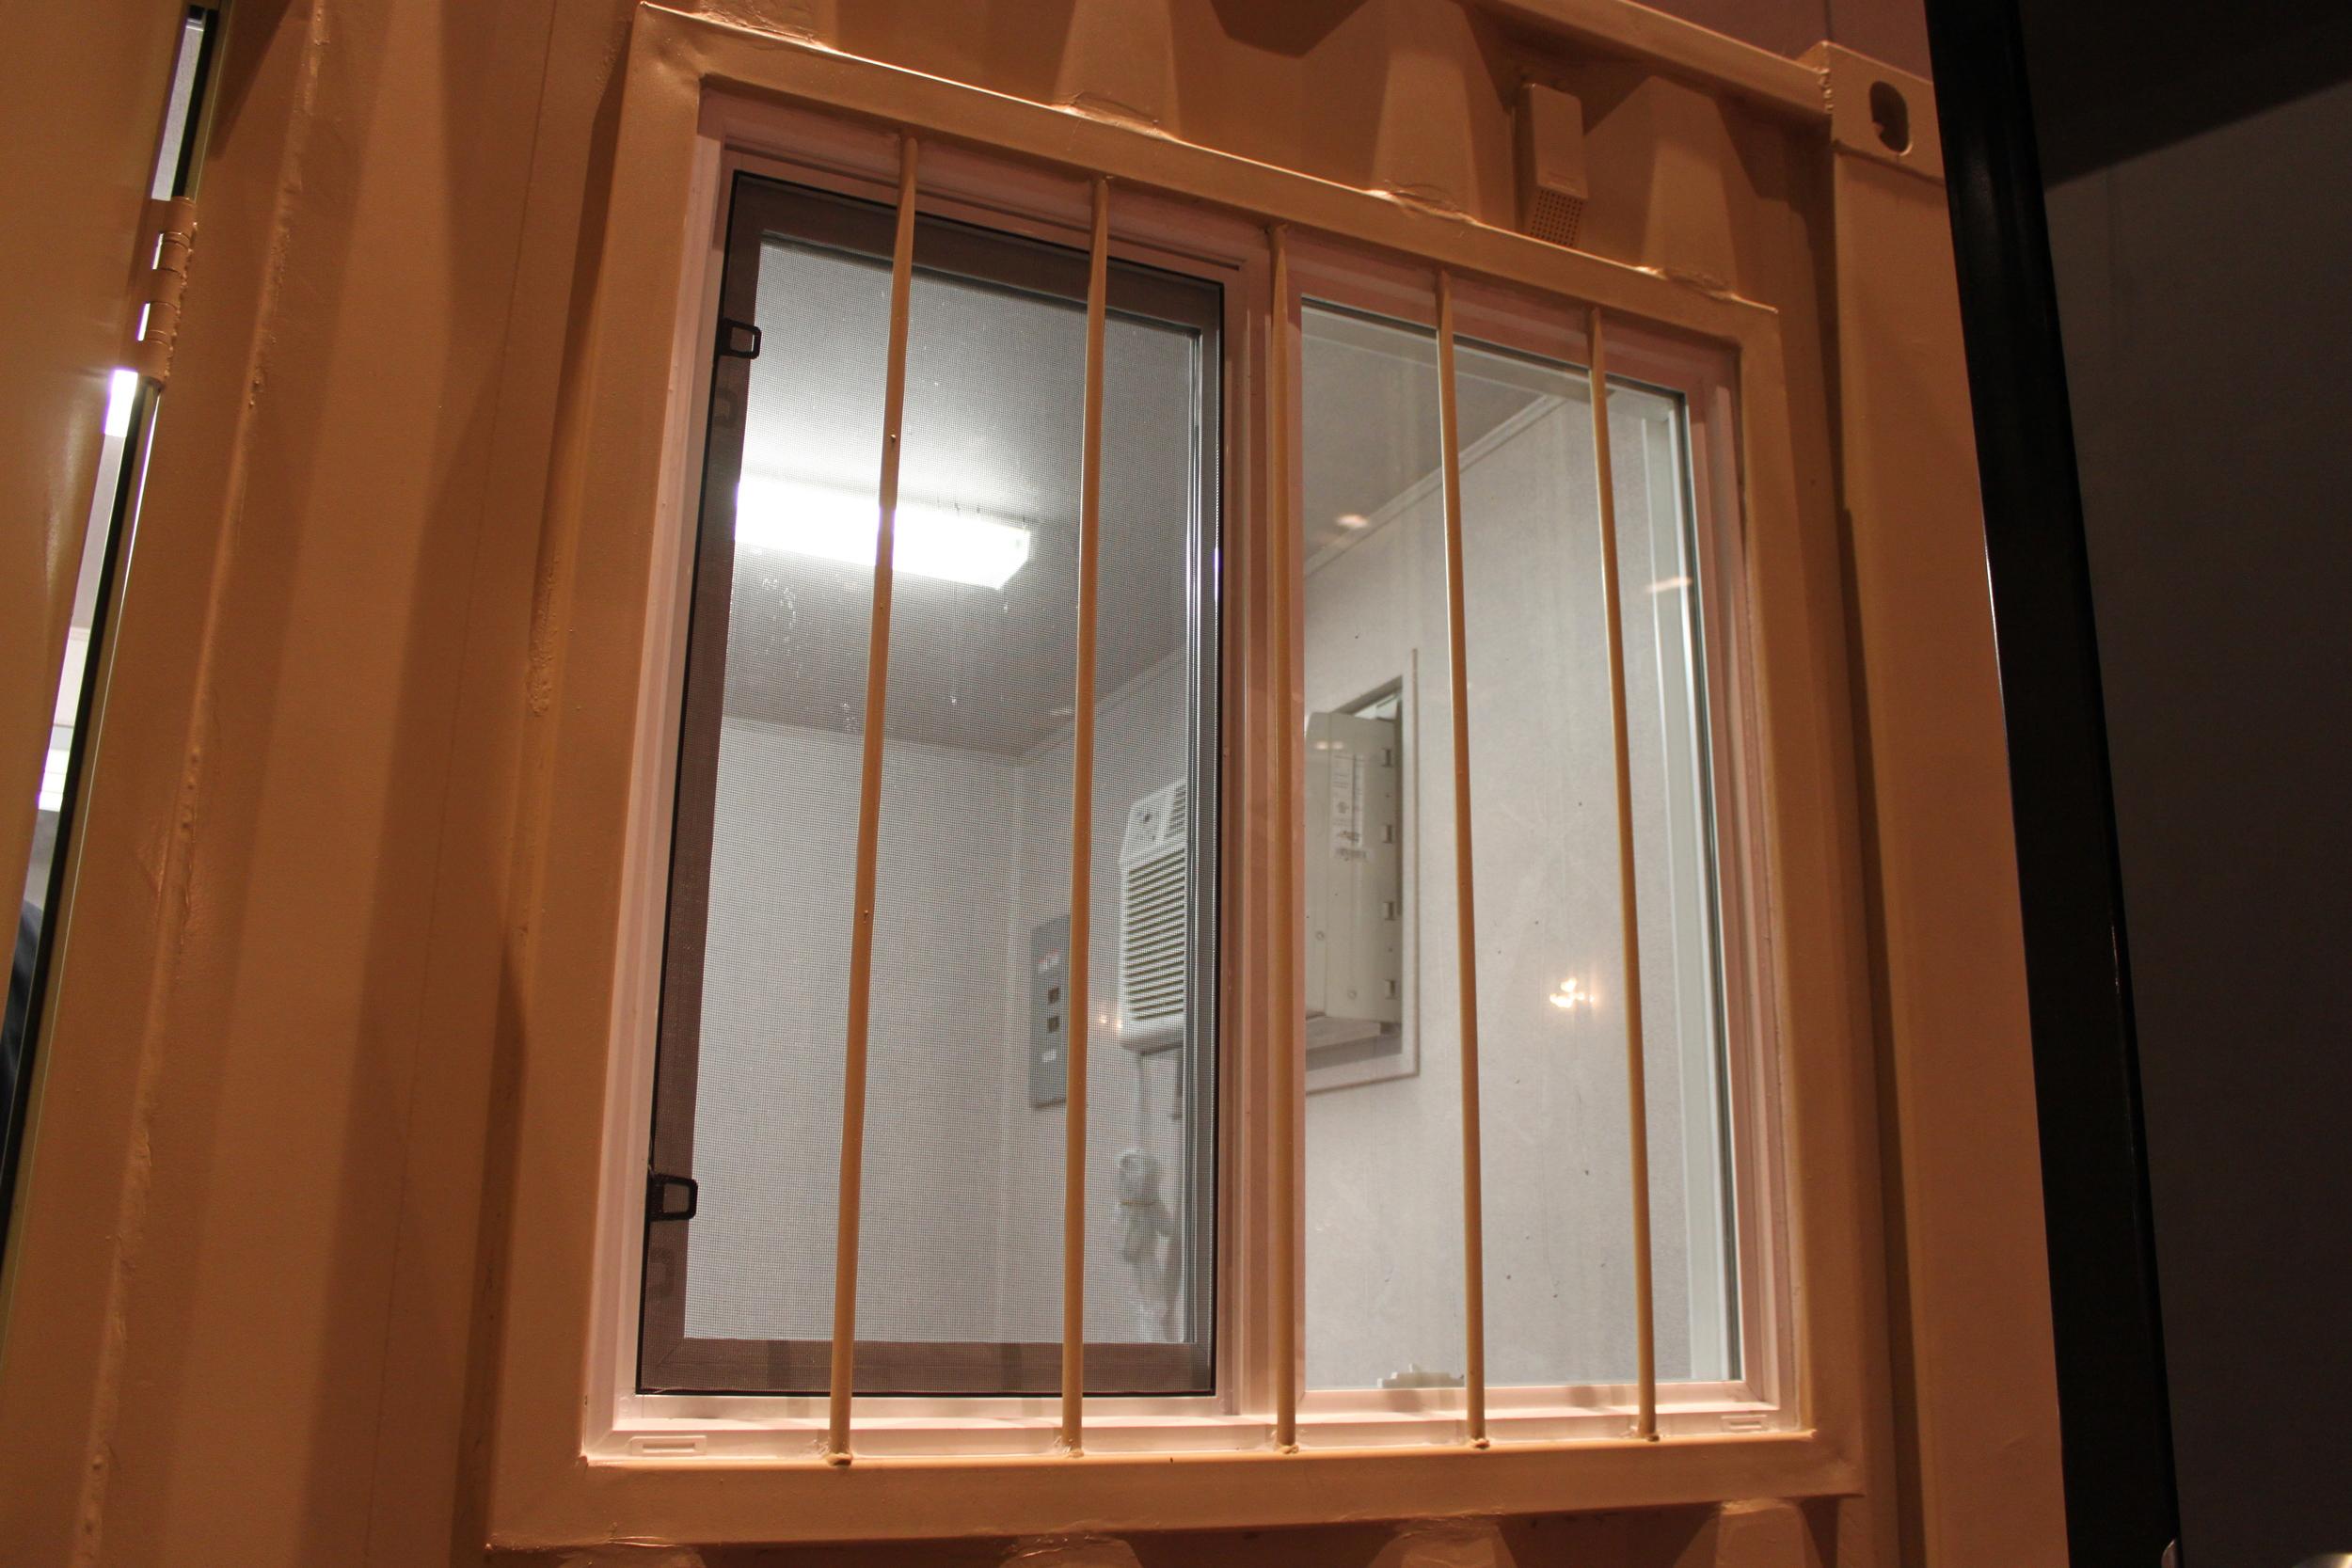 Window kit with bars